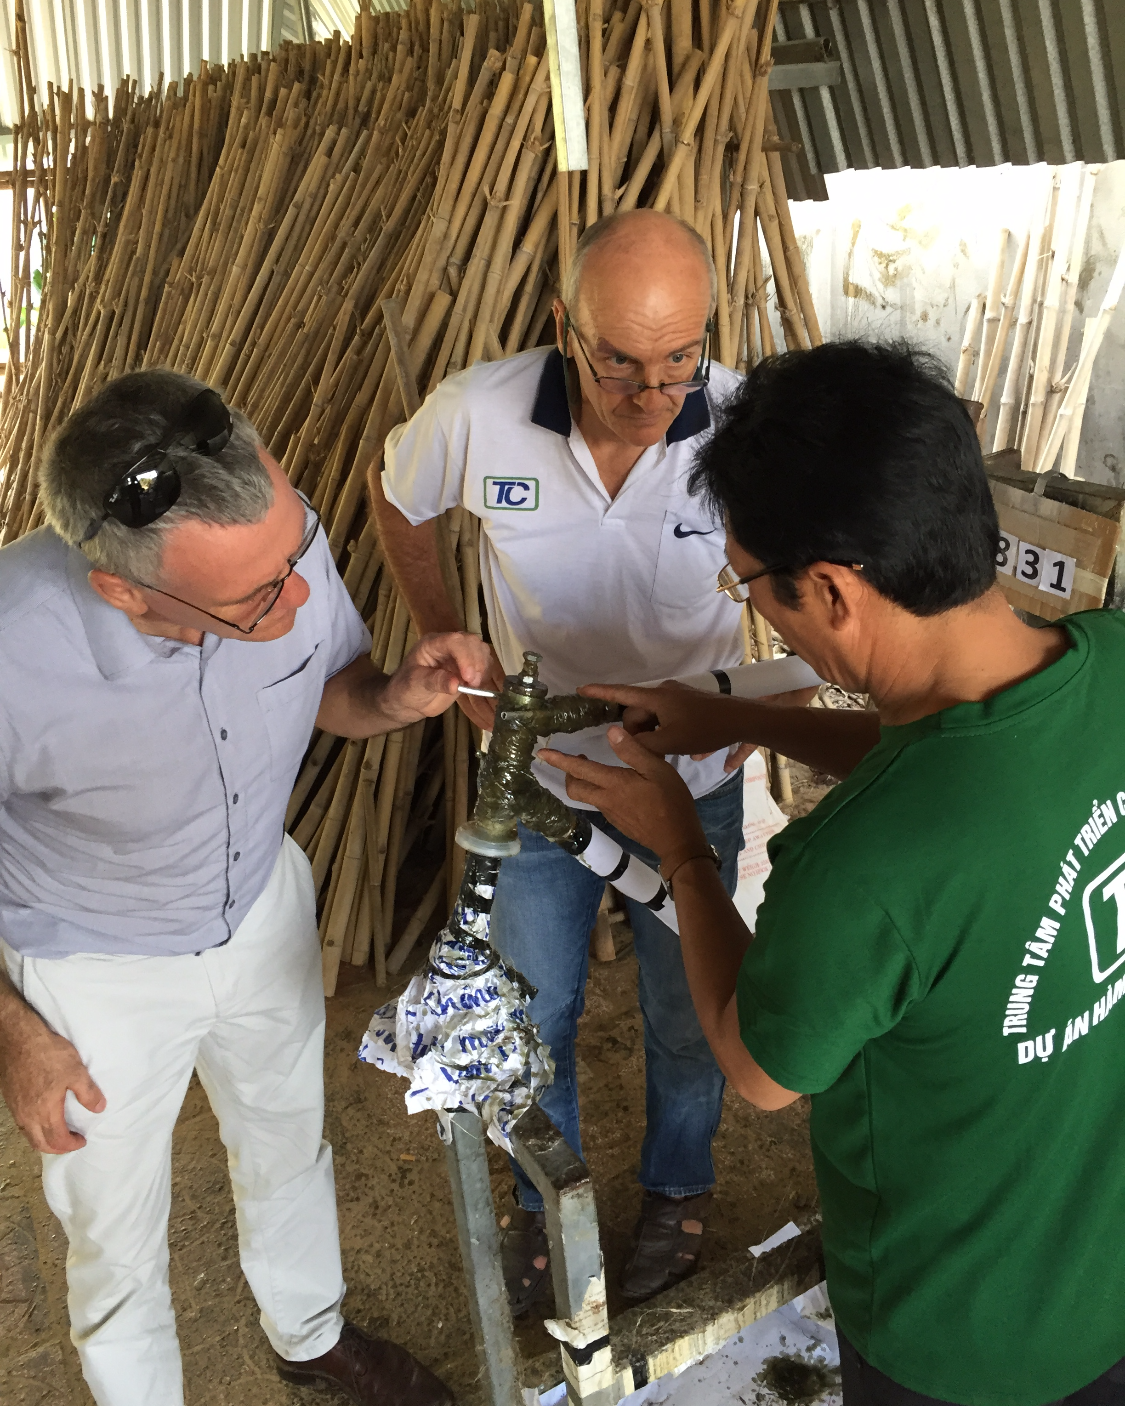 Bambusrahmenkonstruktion